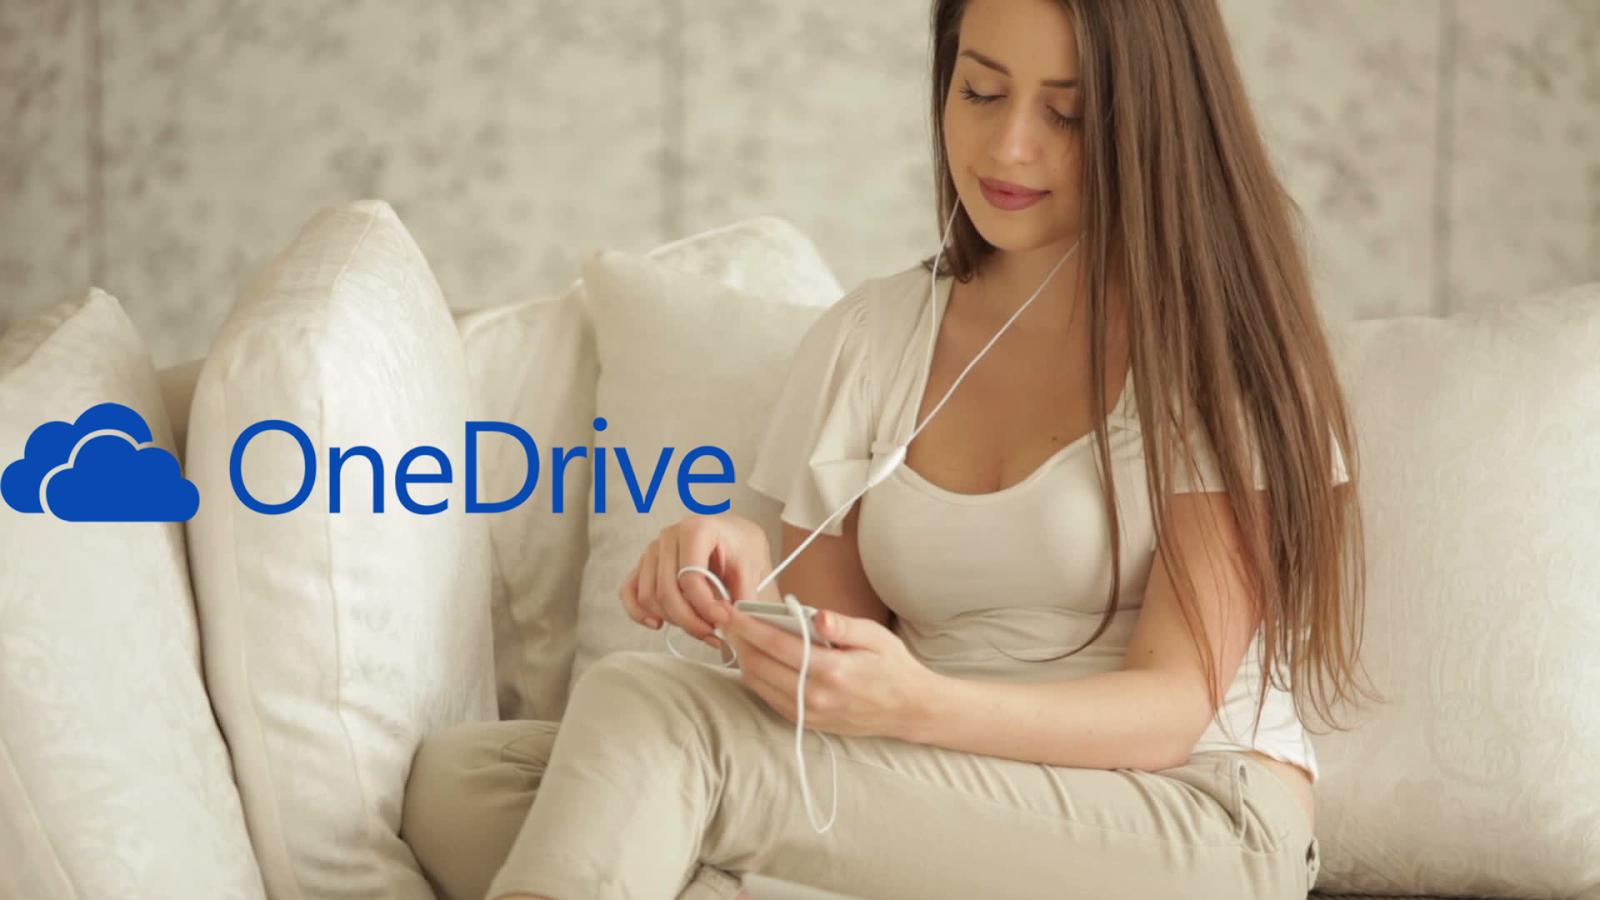 Listas de musica -OneDrive